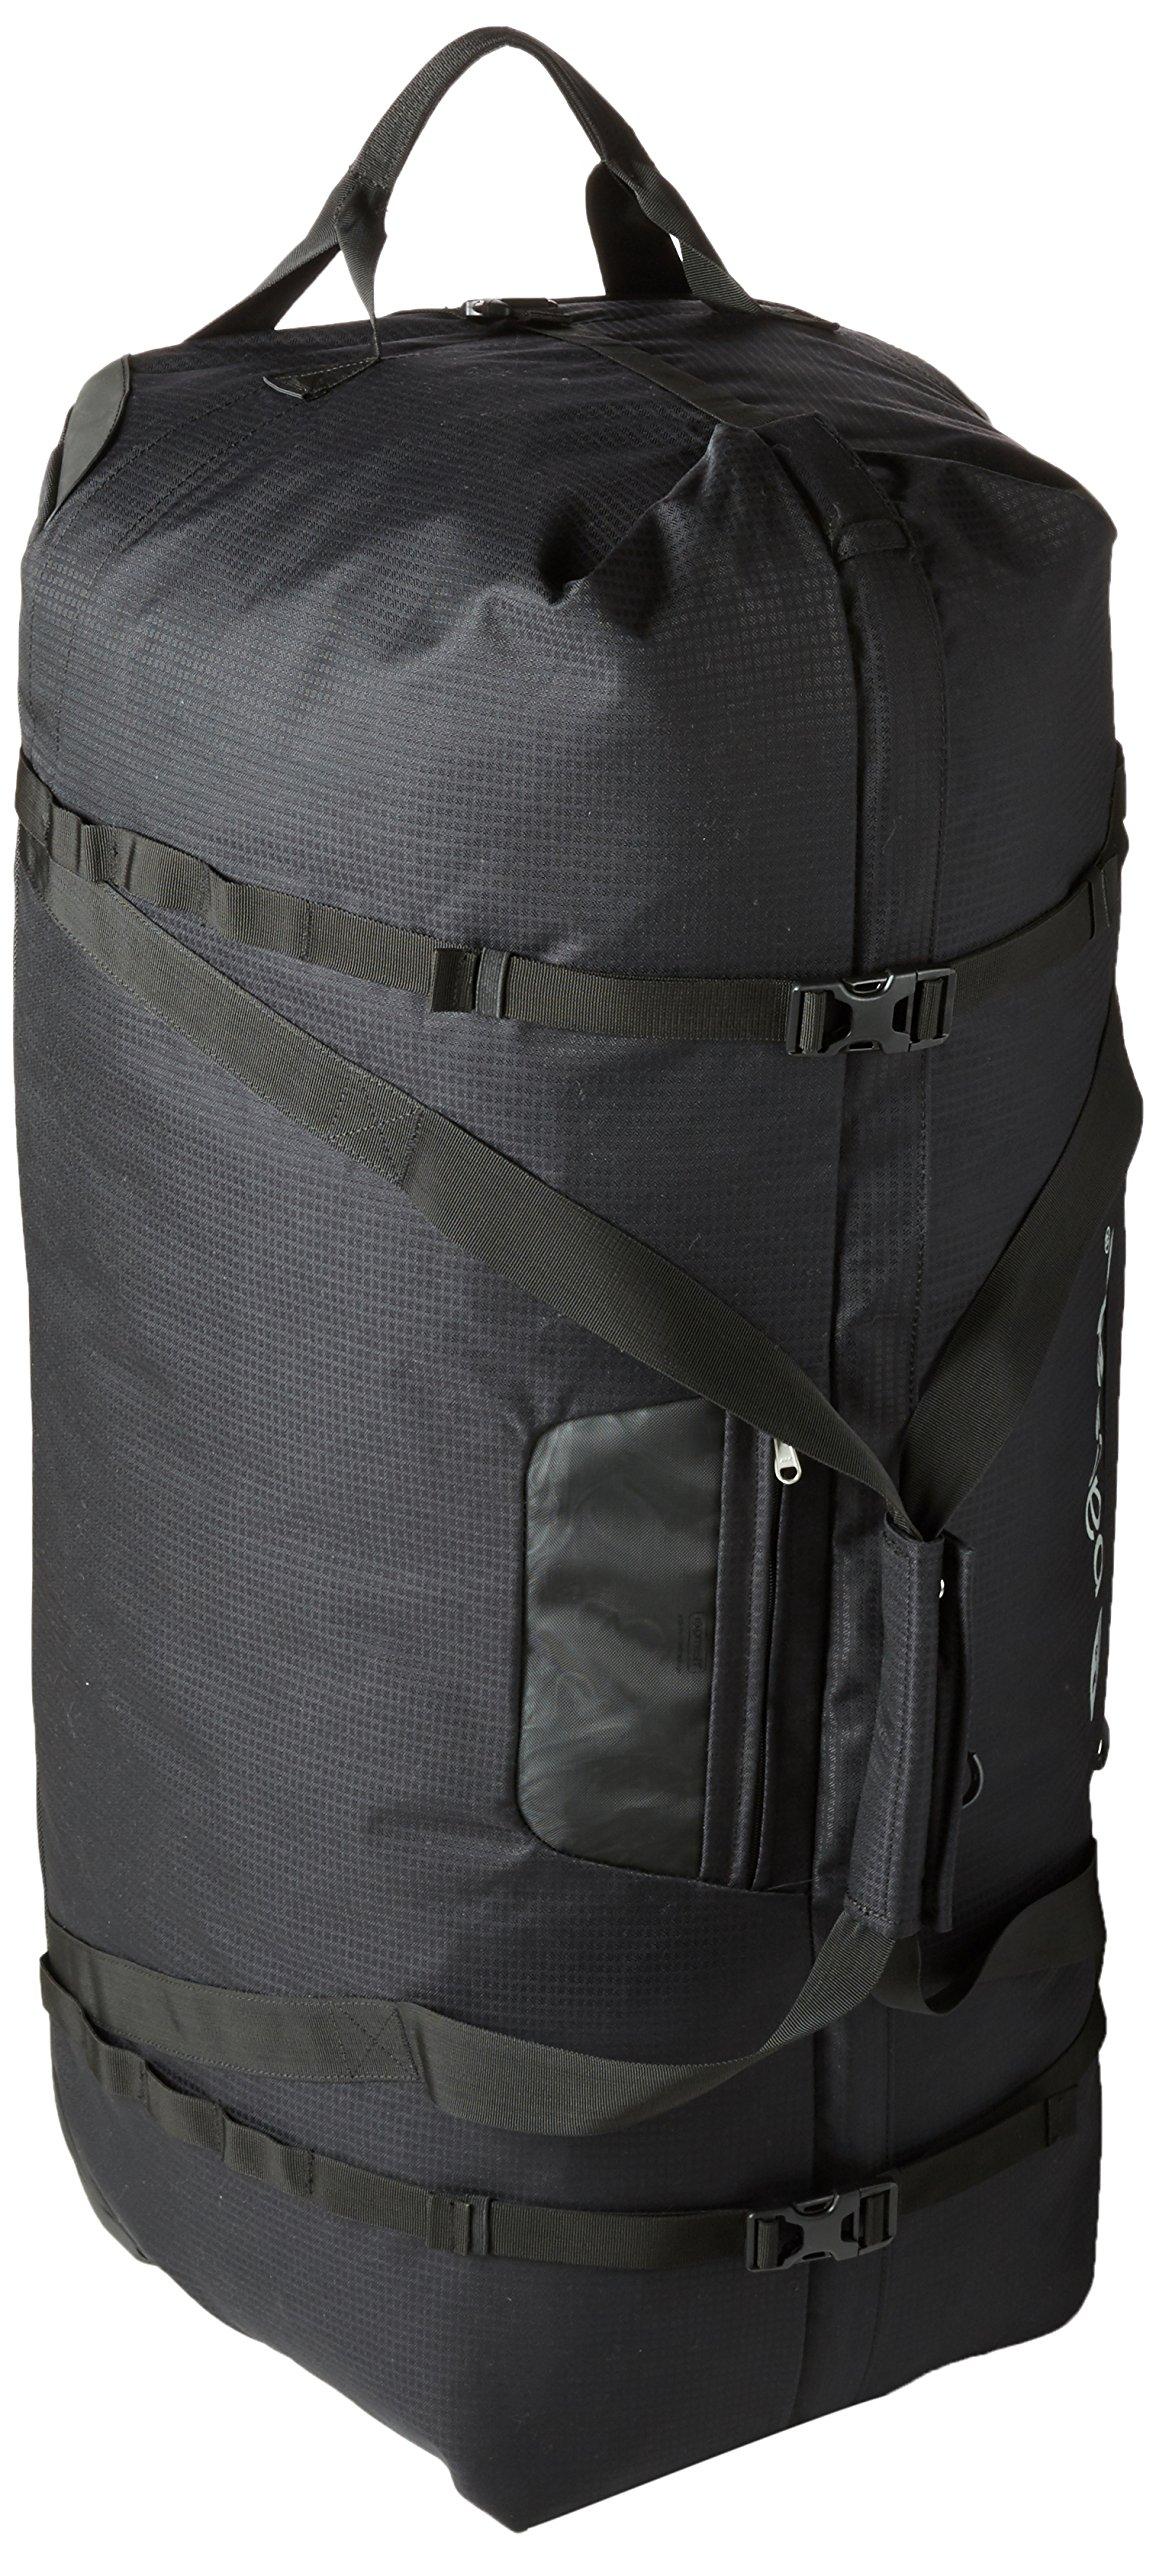 Pacsafe Duffelsafe AT120 Anti-Theft Wheeled Duffel Bag, Black by Pacsafe